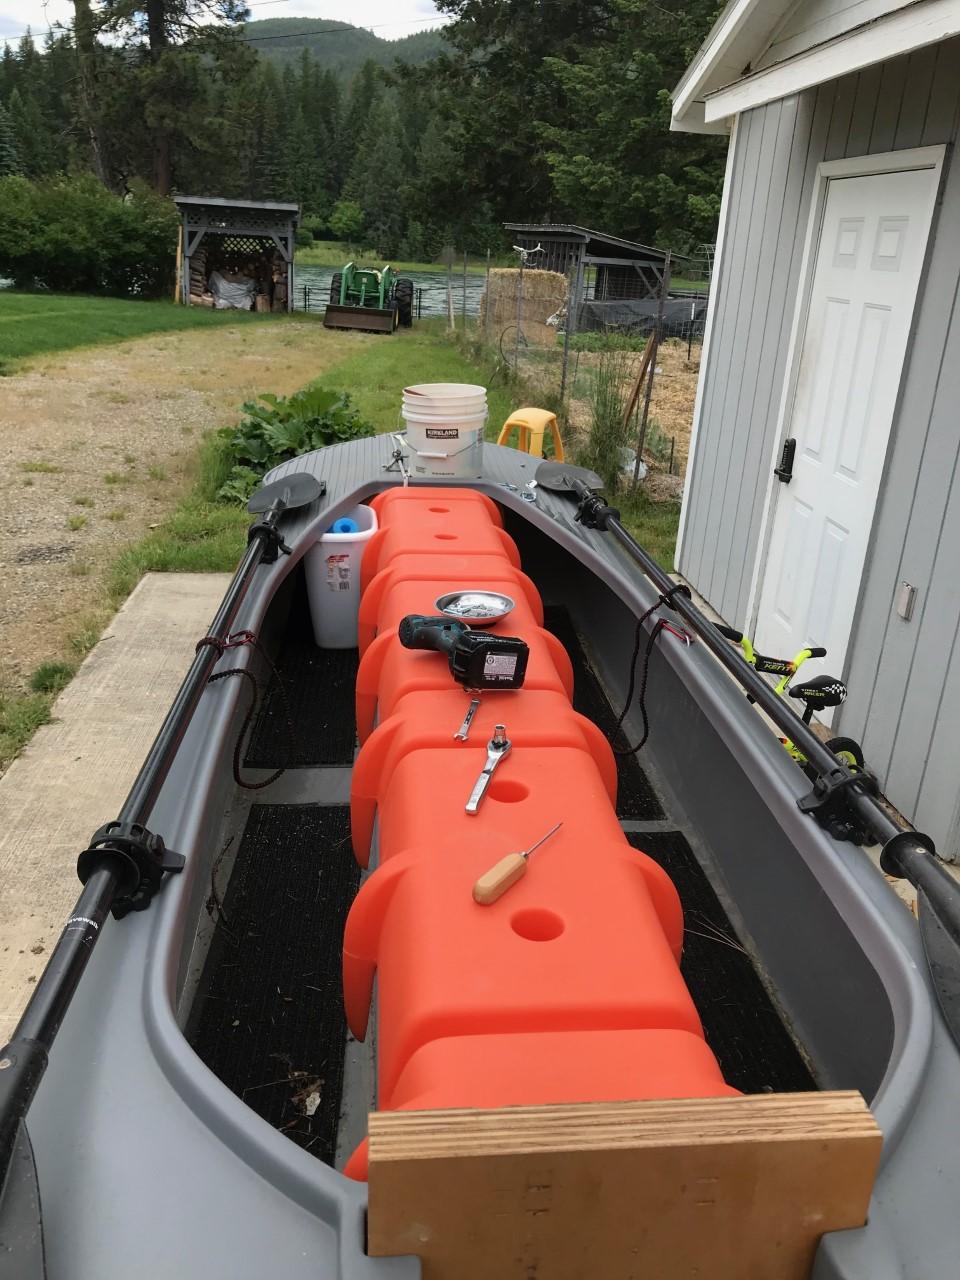 My S4 kayak with 2 Wavewalk paddles